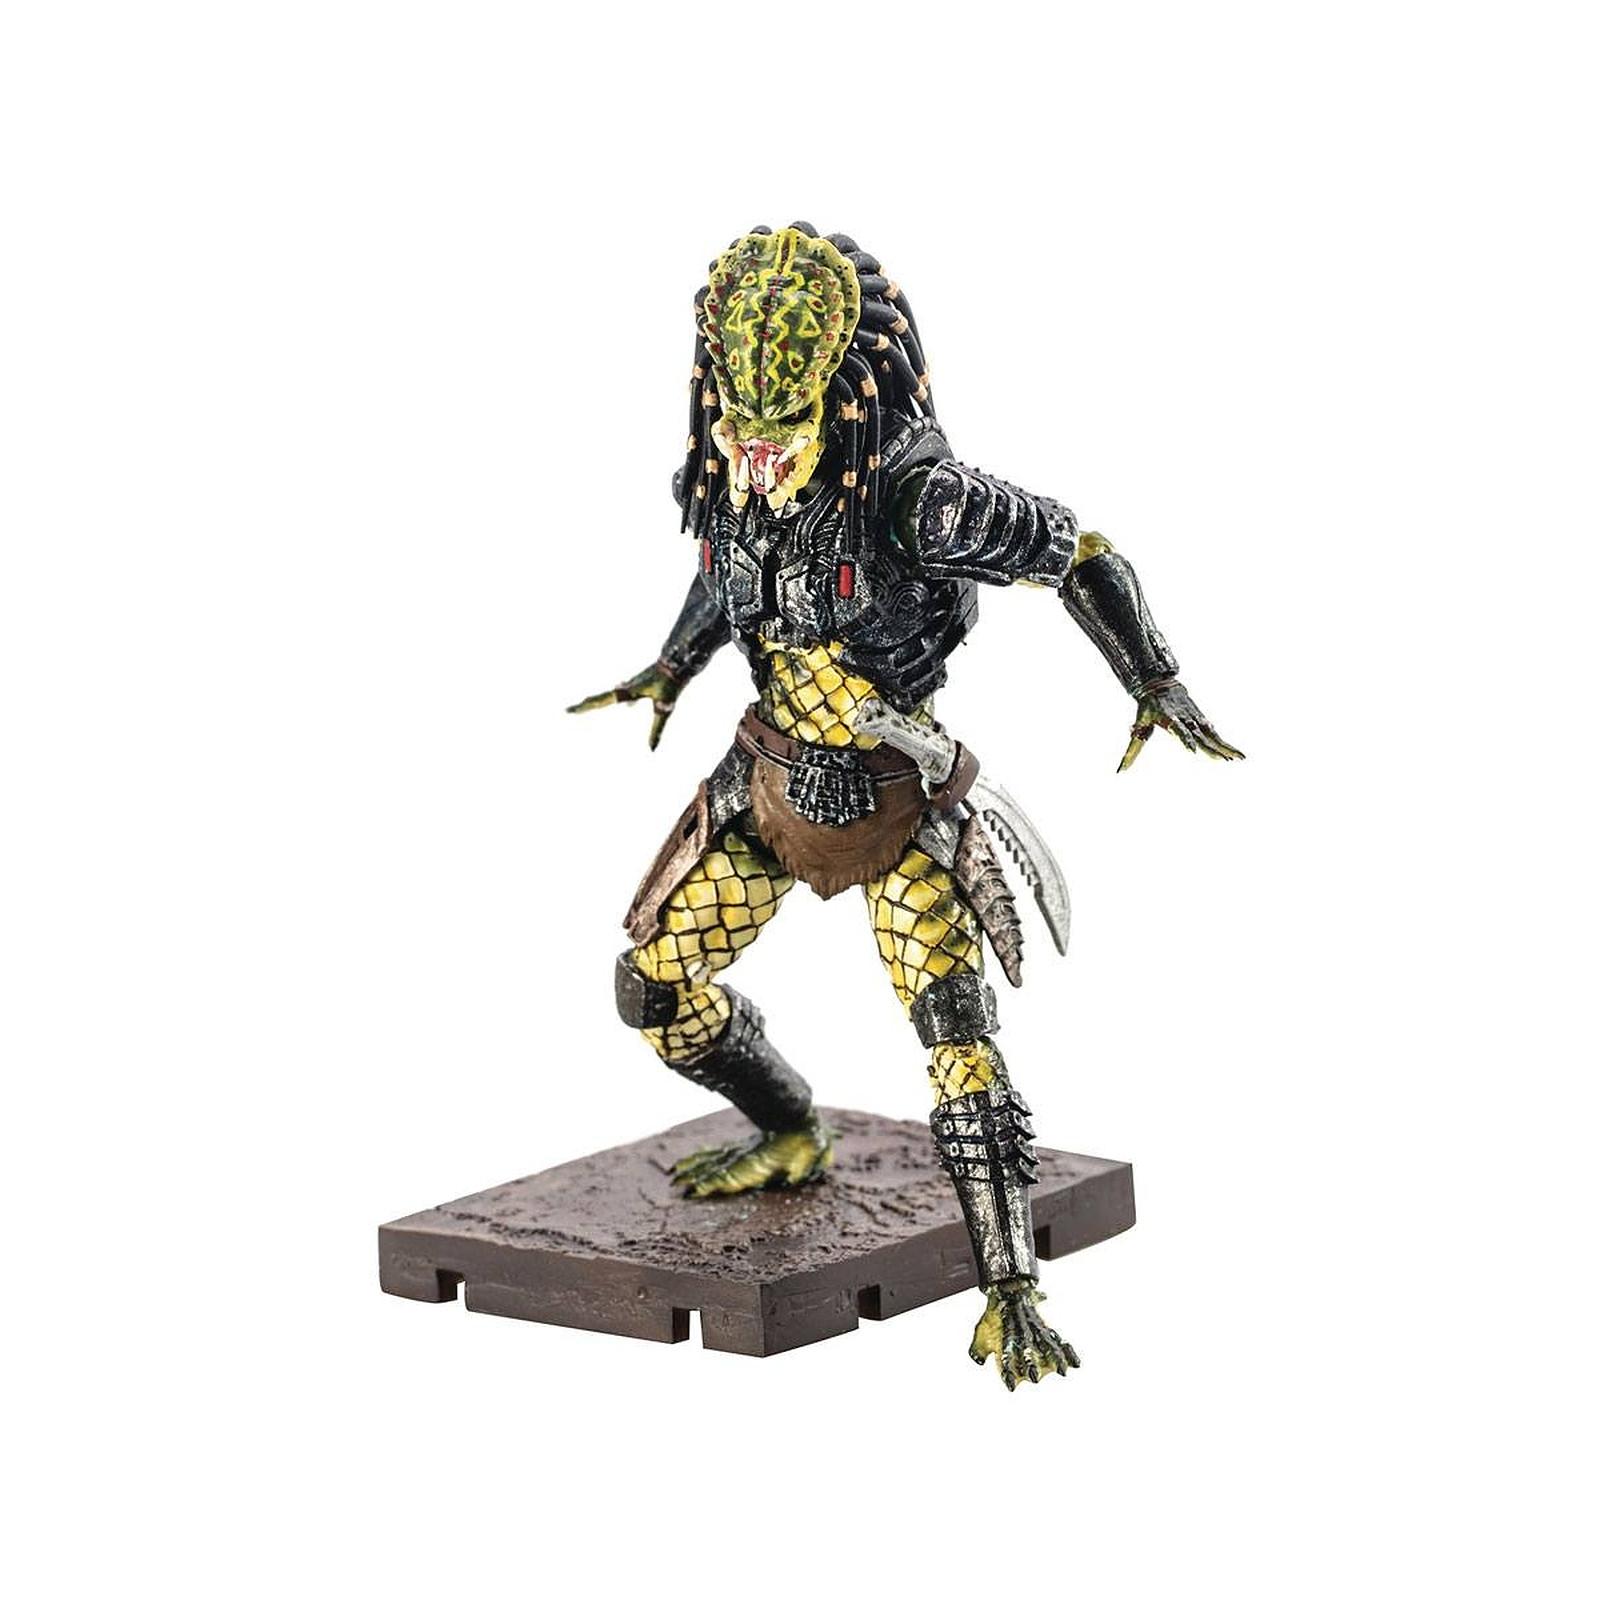 Predator 2 - Figurine 1/18 Lost Predator Previews Exclusive 11 cm